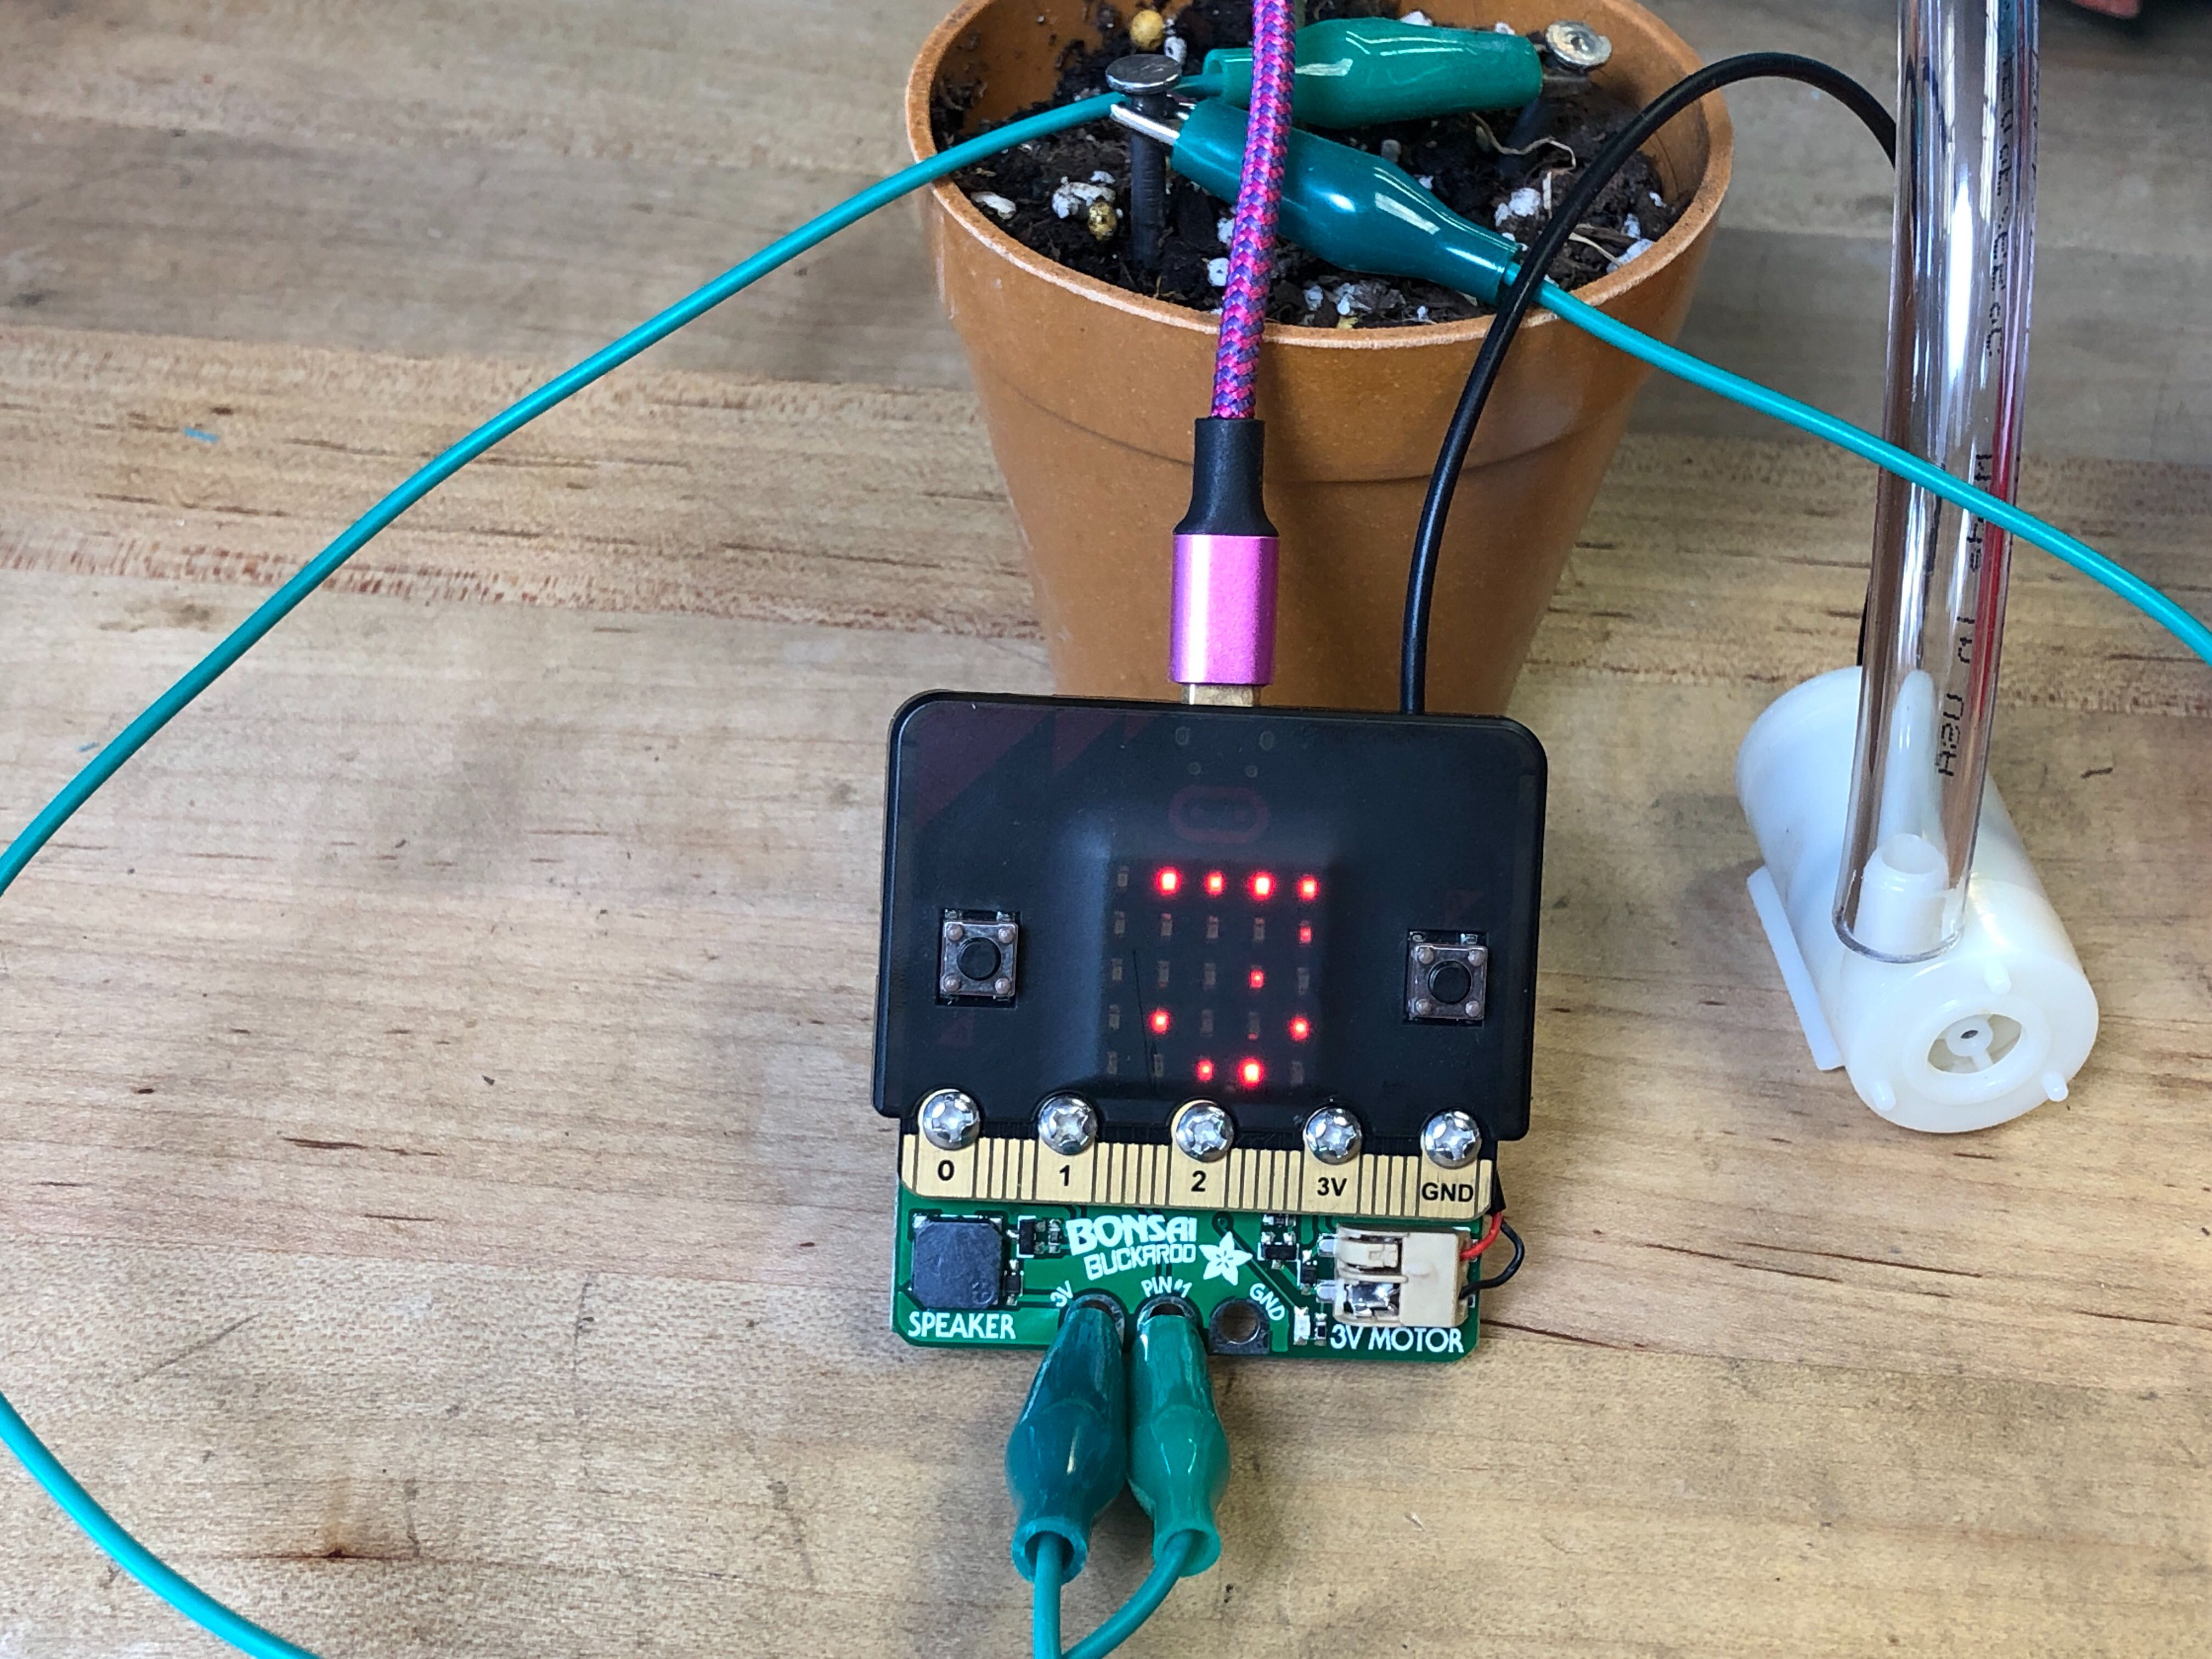 sensors_Bonsai_Buckaroo_micro-bit_soil_level.jpg